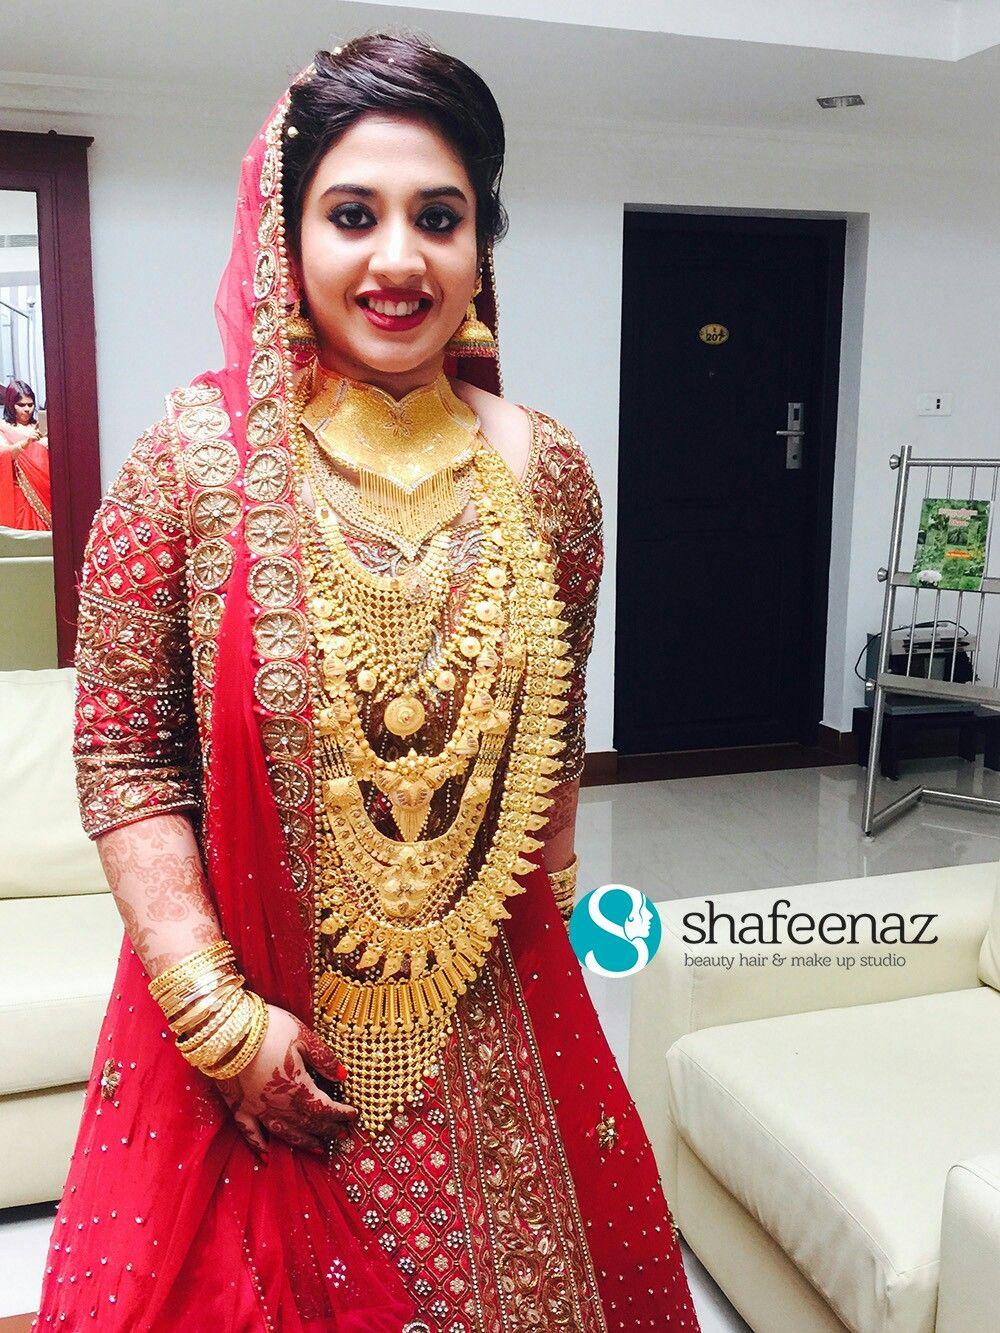 Indian bridal by manojmanoharan on kerala bride | Indian bridal makeup